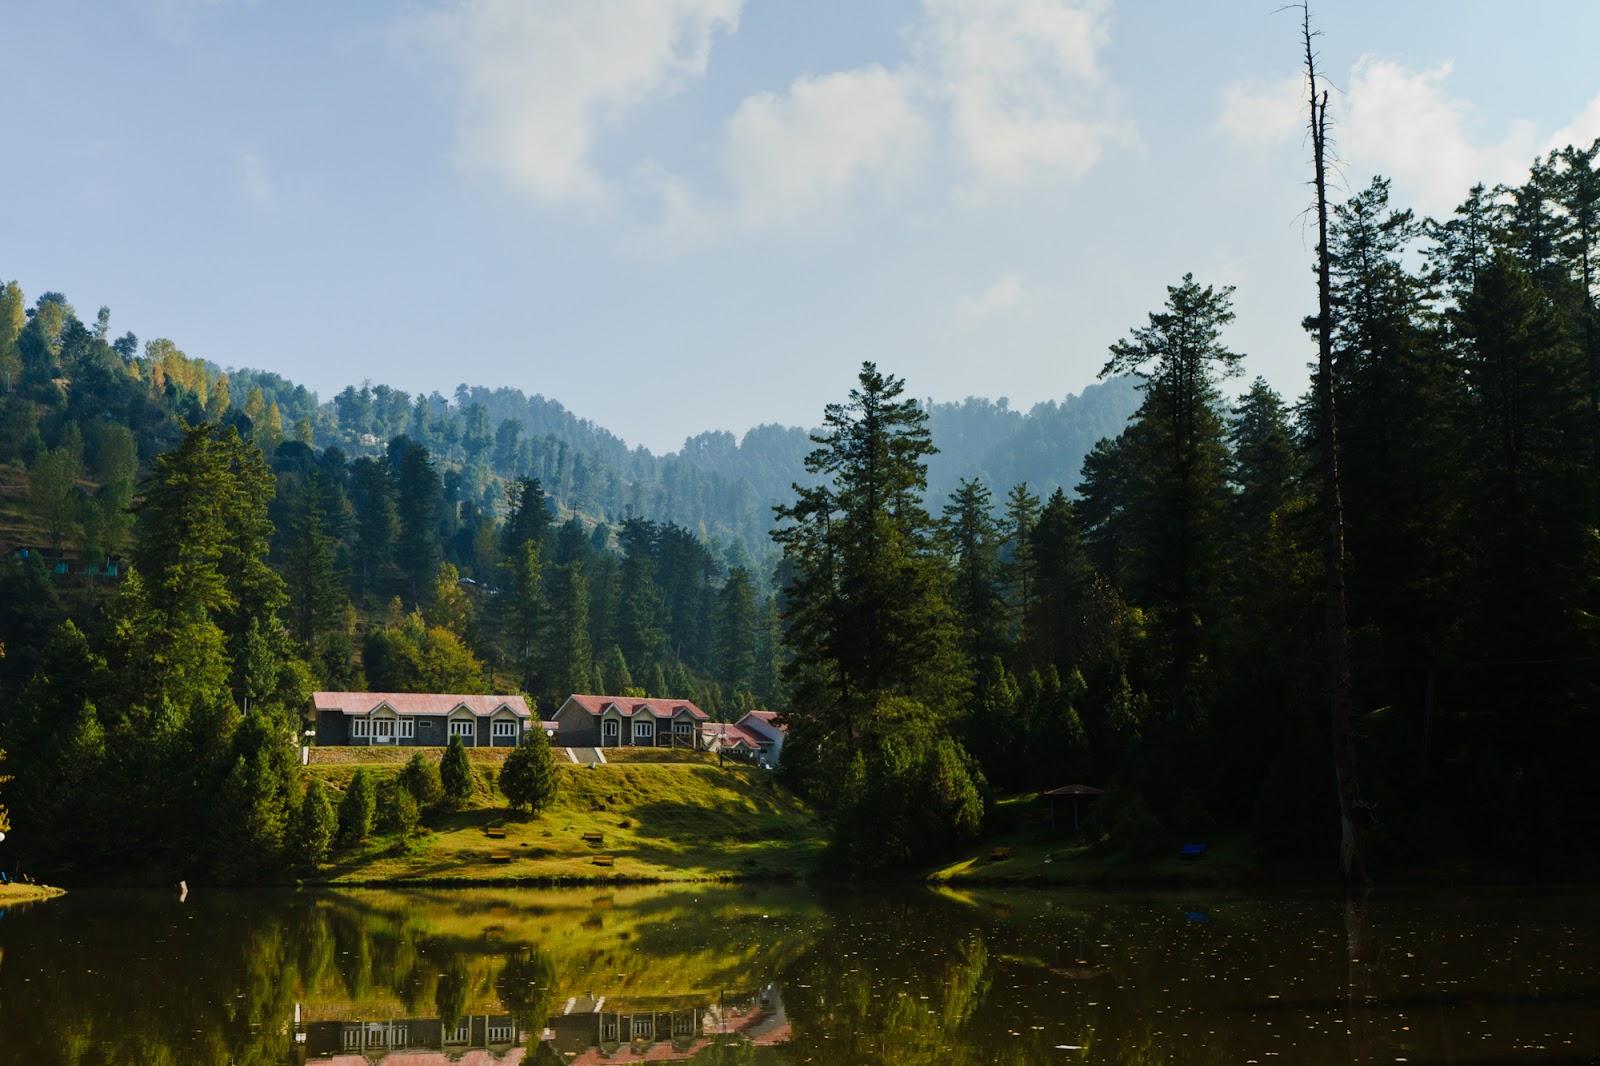 Hd wallpaper kashmir - Tags Nice Valley Kashmir Valley Wallpapers